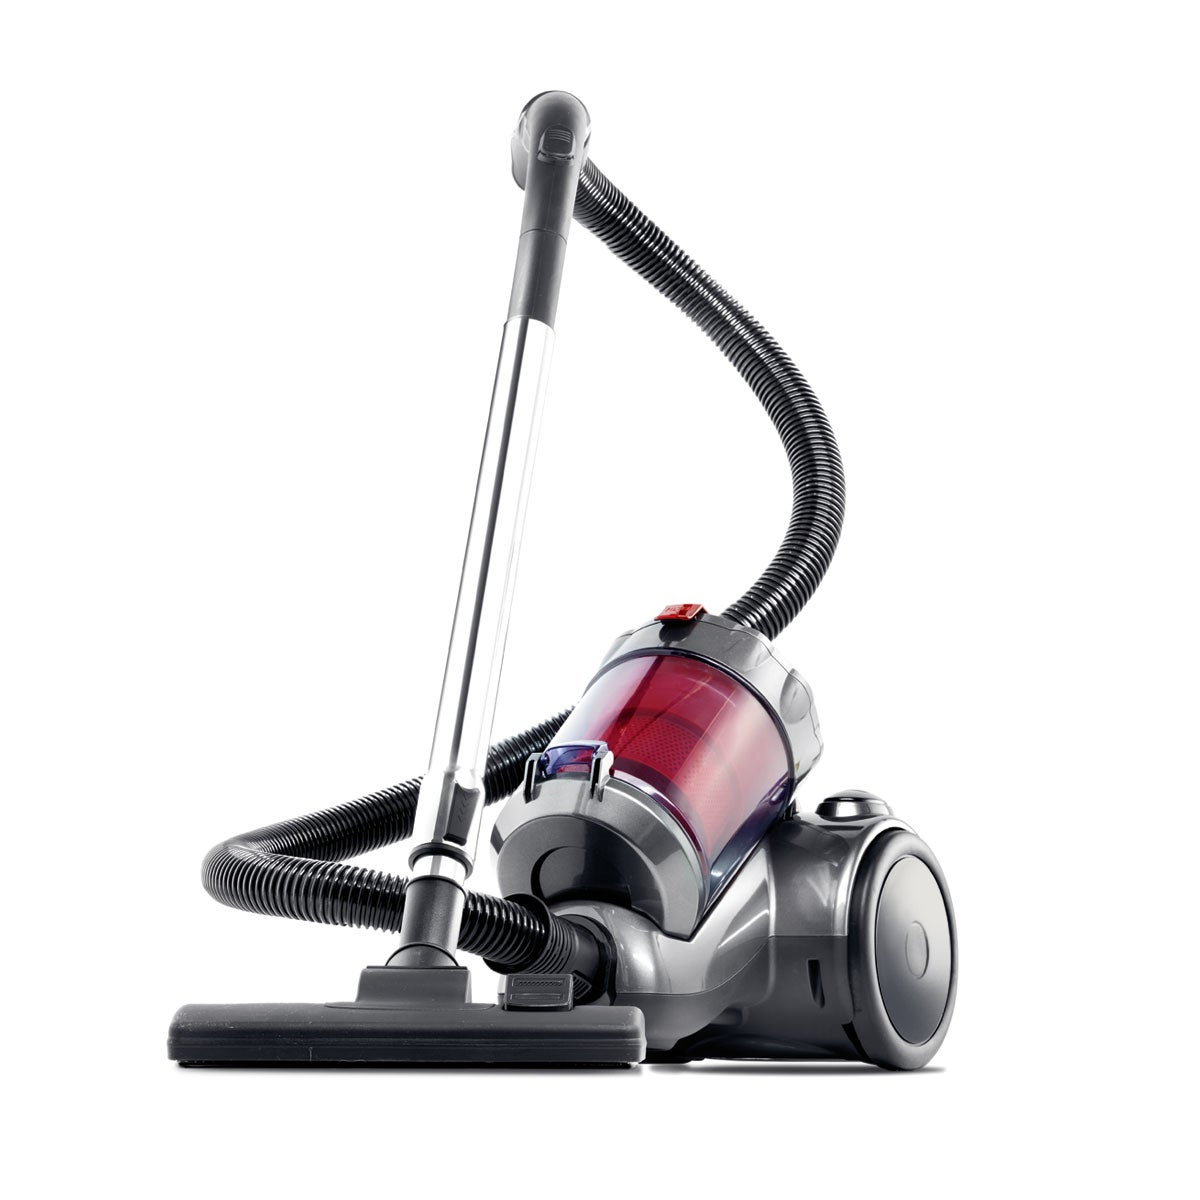 Multi Cyclonic 2400W Bagless Vacuum Cleaner